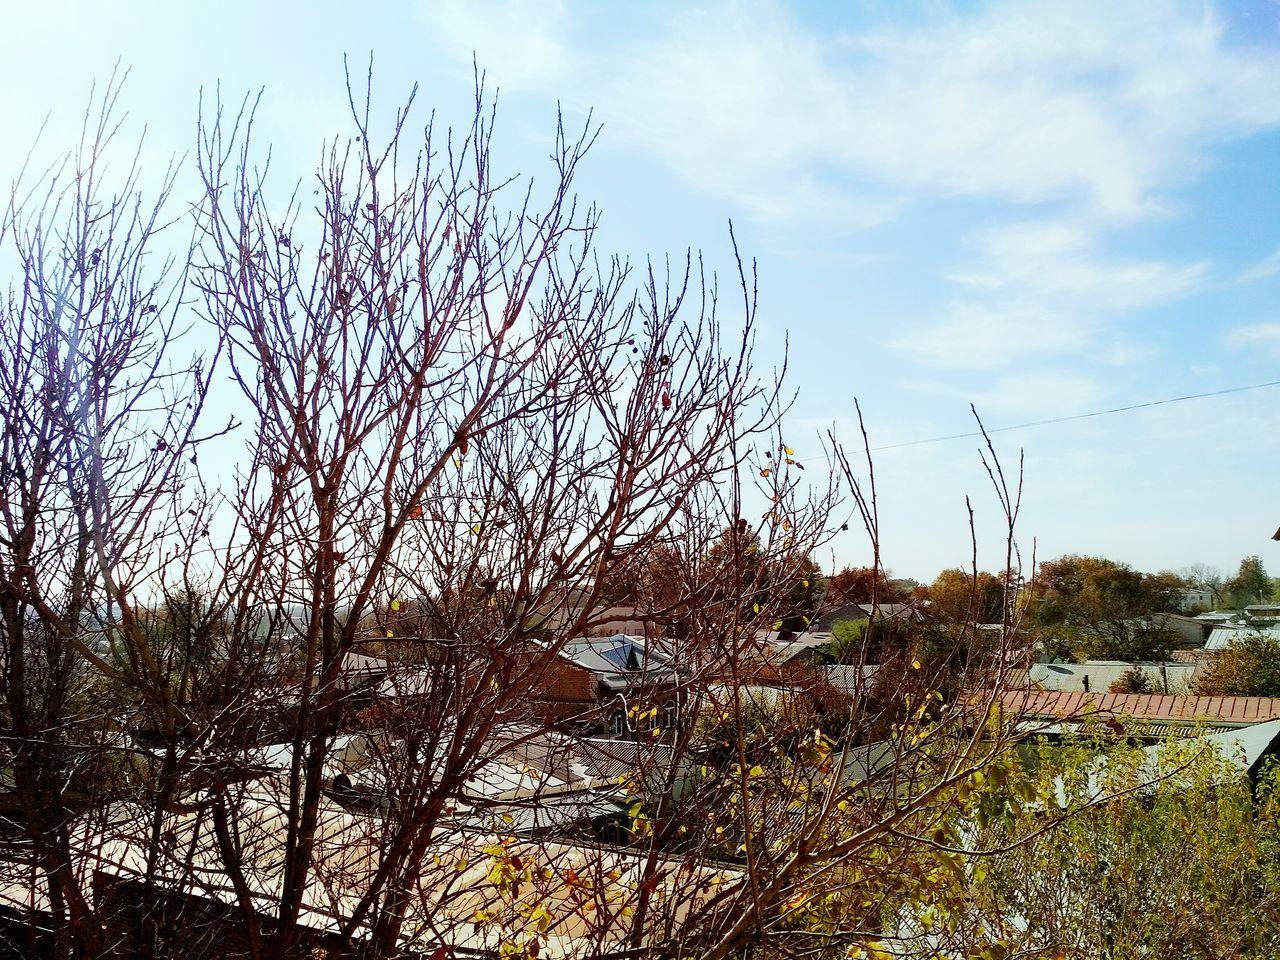 Outdoors Sunday Morning In Tashkent Tashkent ♥ Day Nature Sky Perspectives On Nature